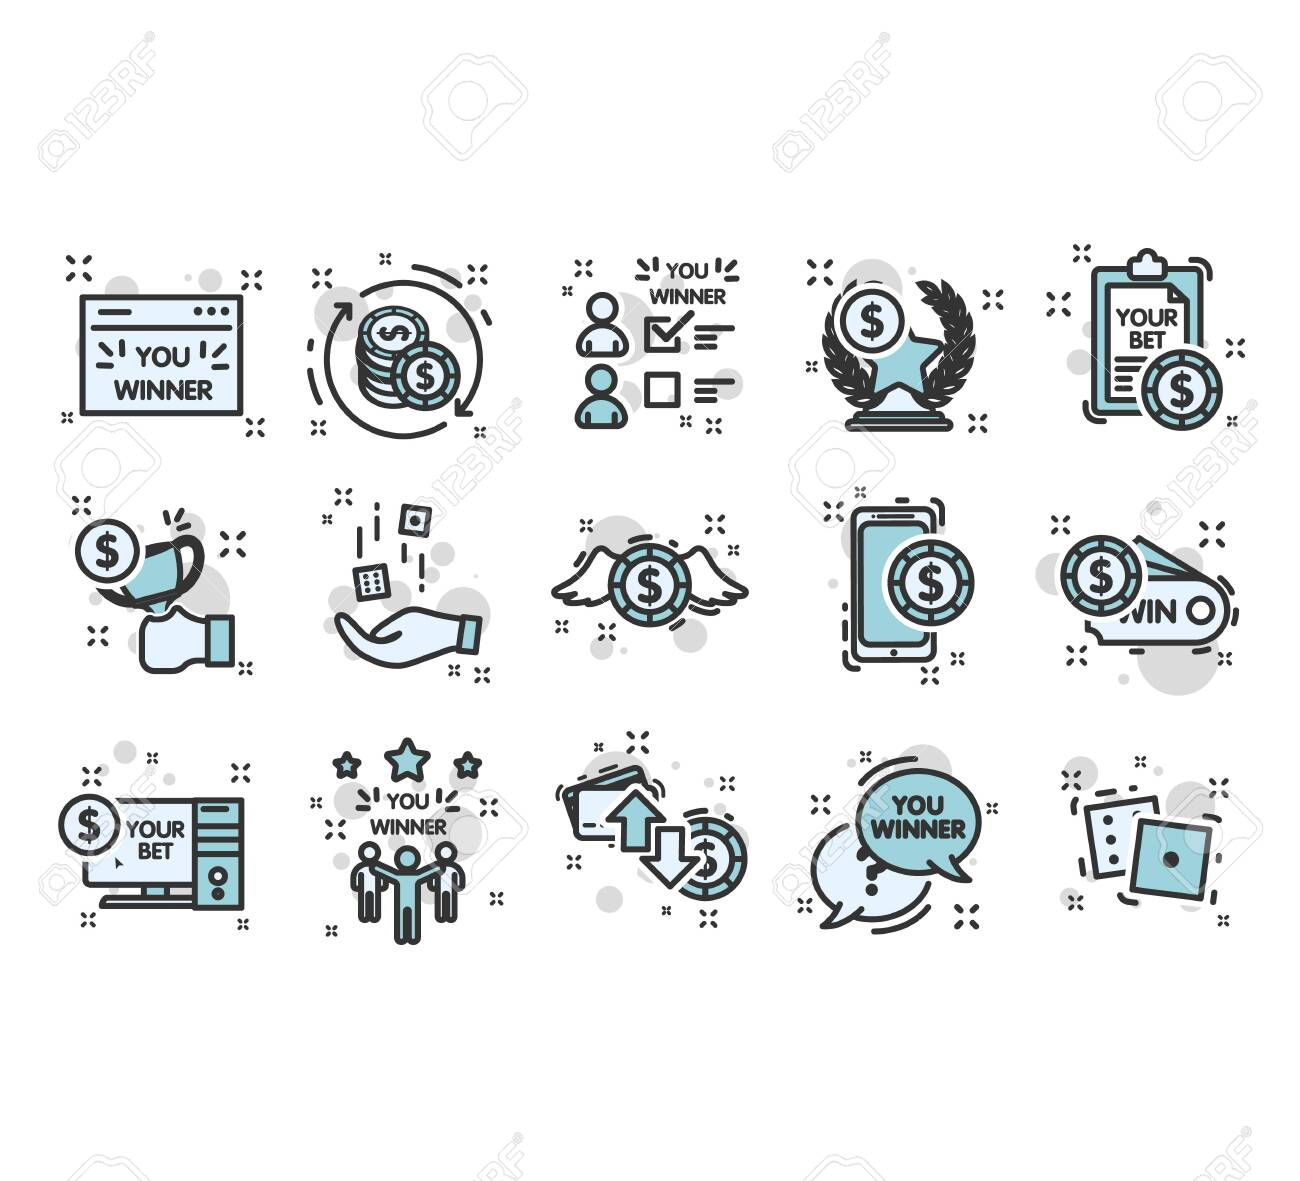 Betting icons for desktop bbc democracy eu referendum betting